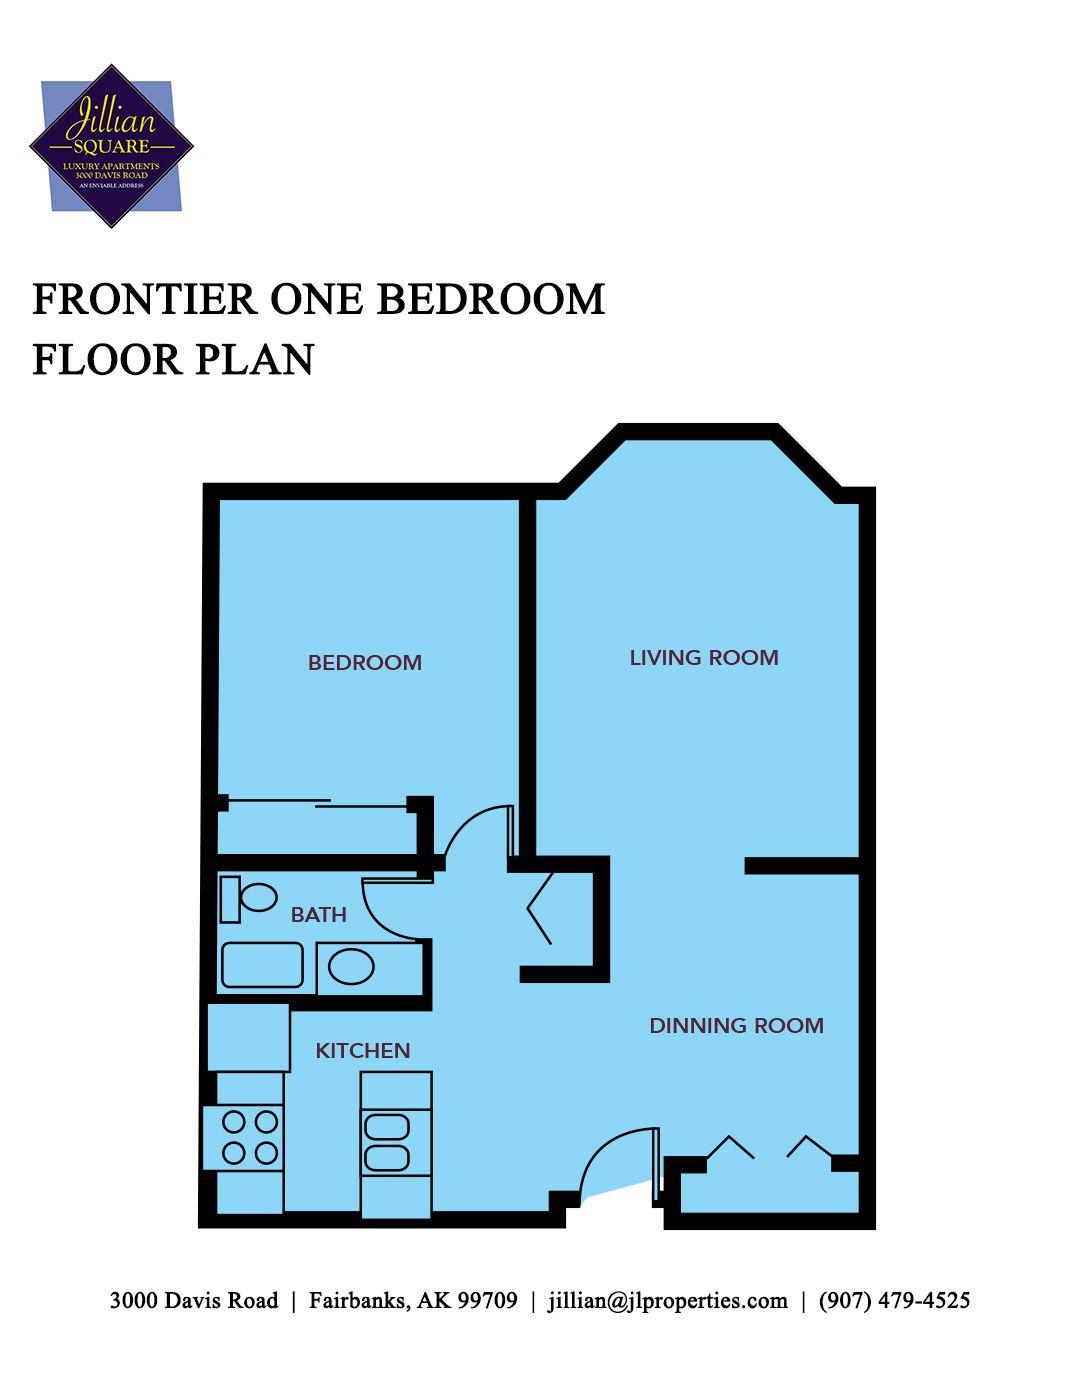 Fairbanks alaska apartments jillian square apartments for Frontier plans